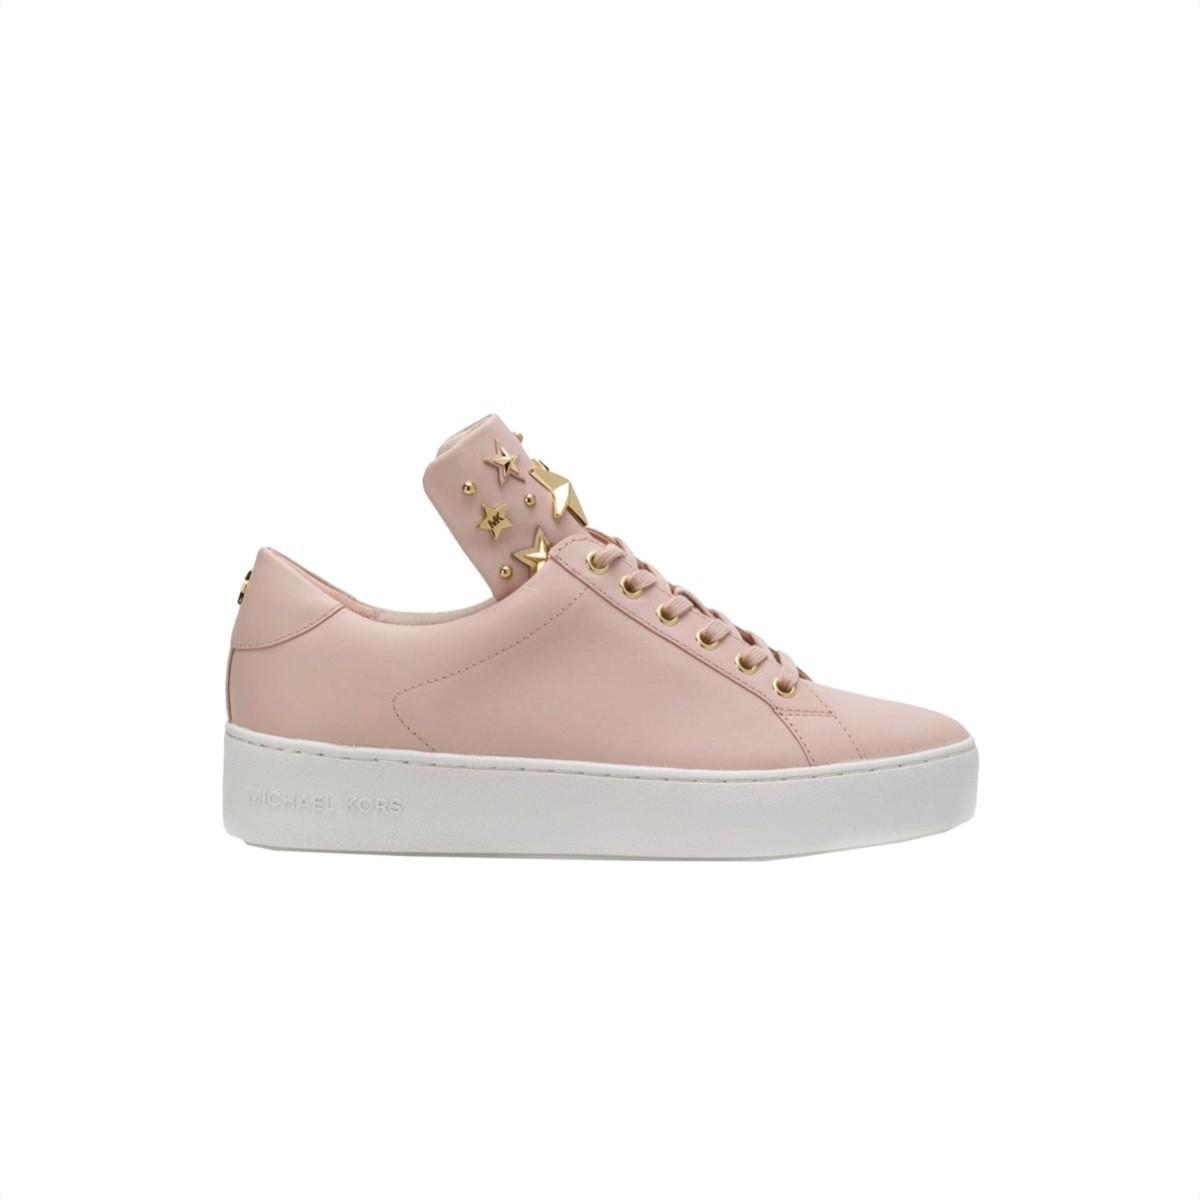 MICHAEL KORS - Mindy Lace Up - Soft Pink